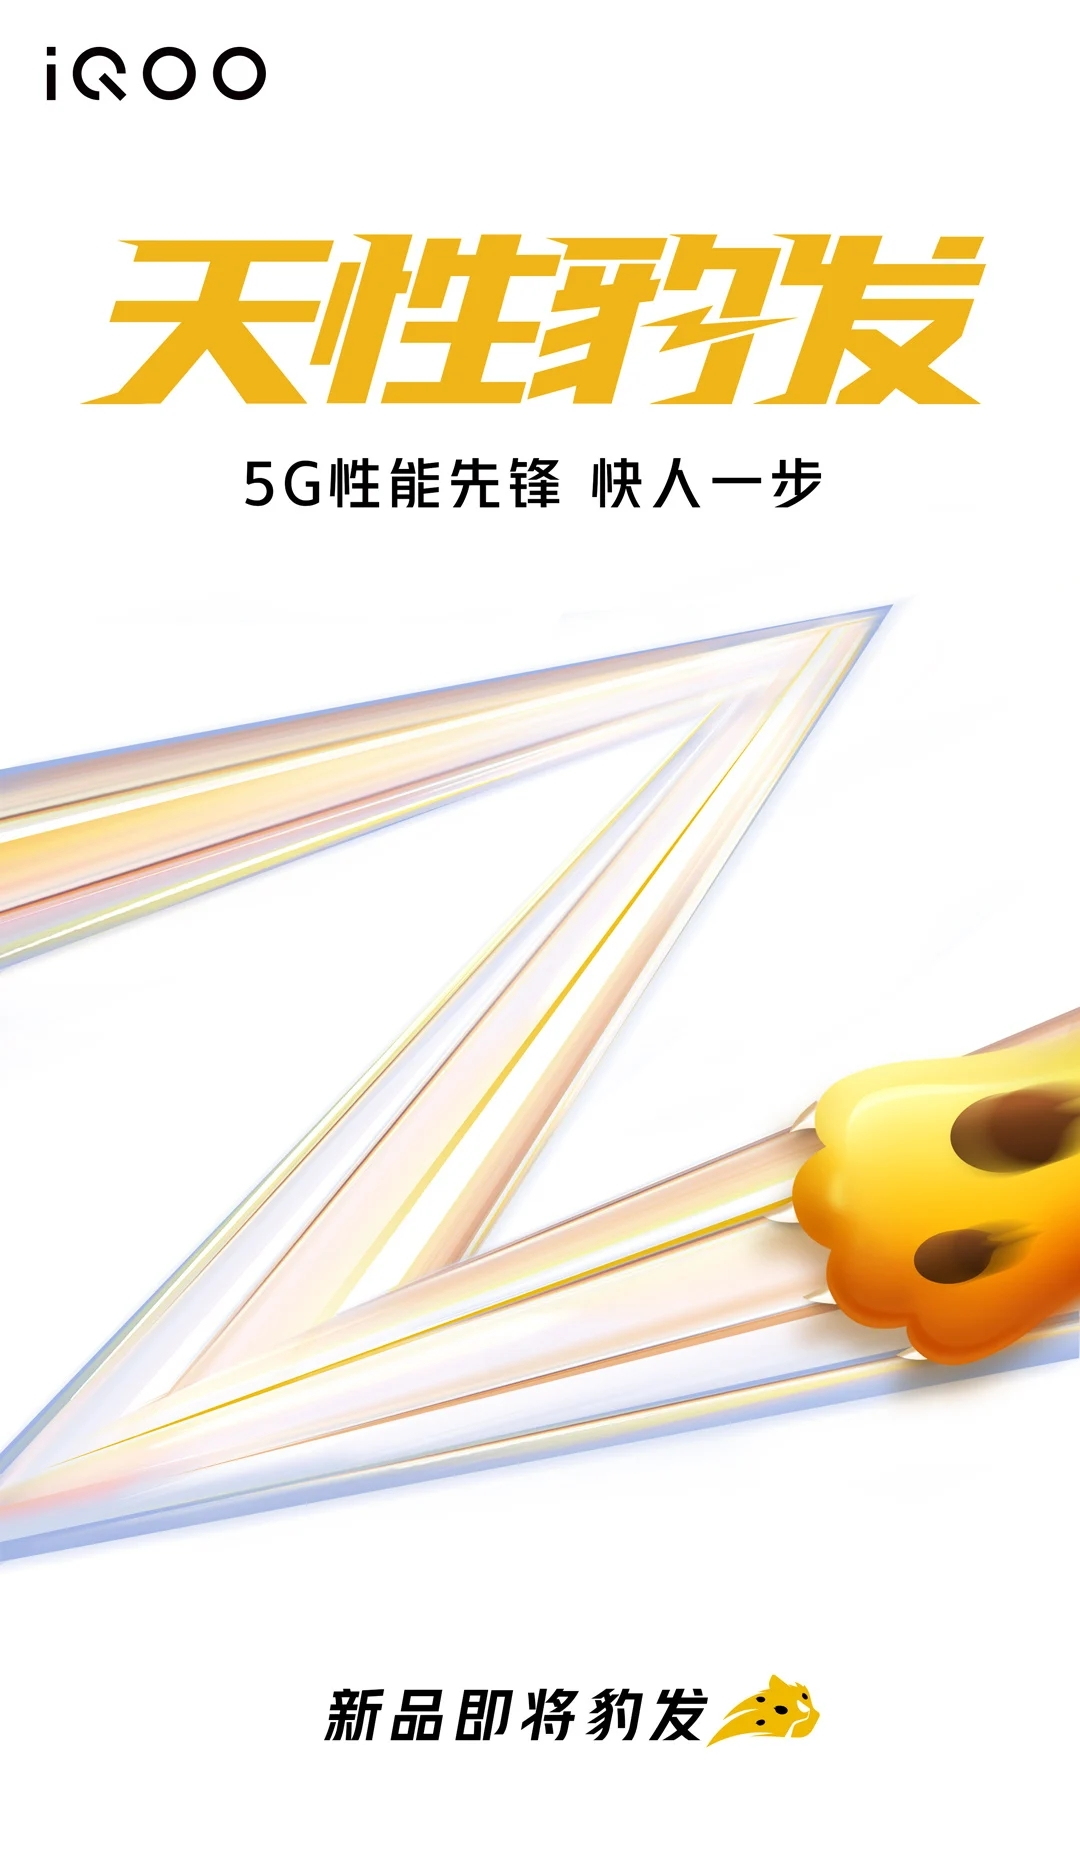 iqoo-z3-teaser